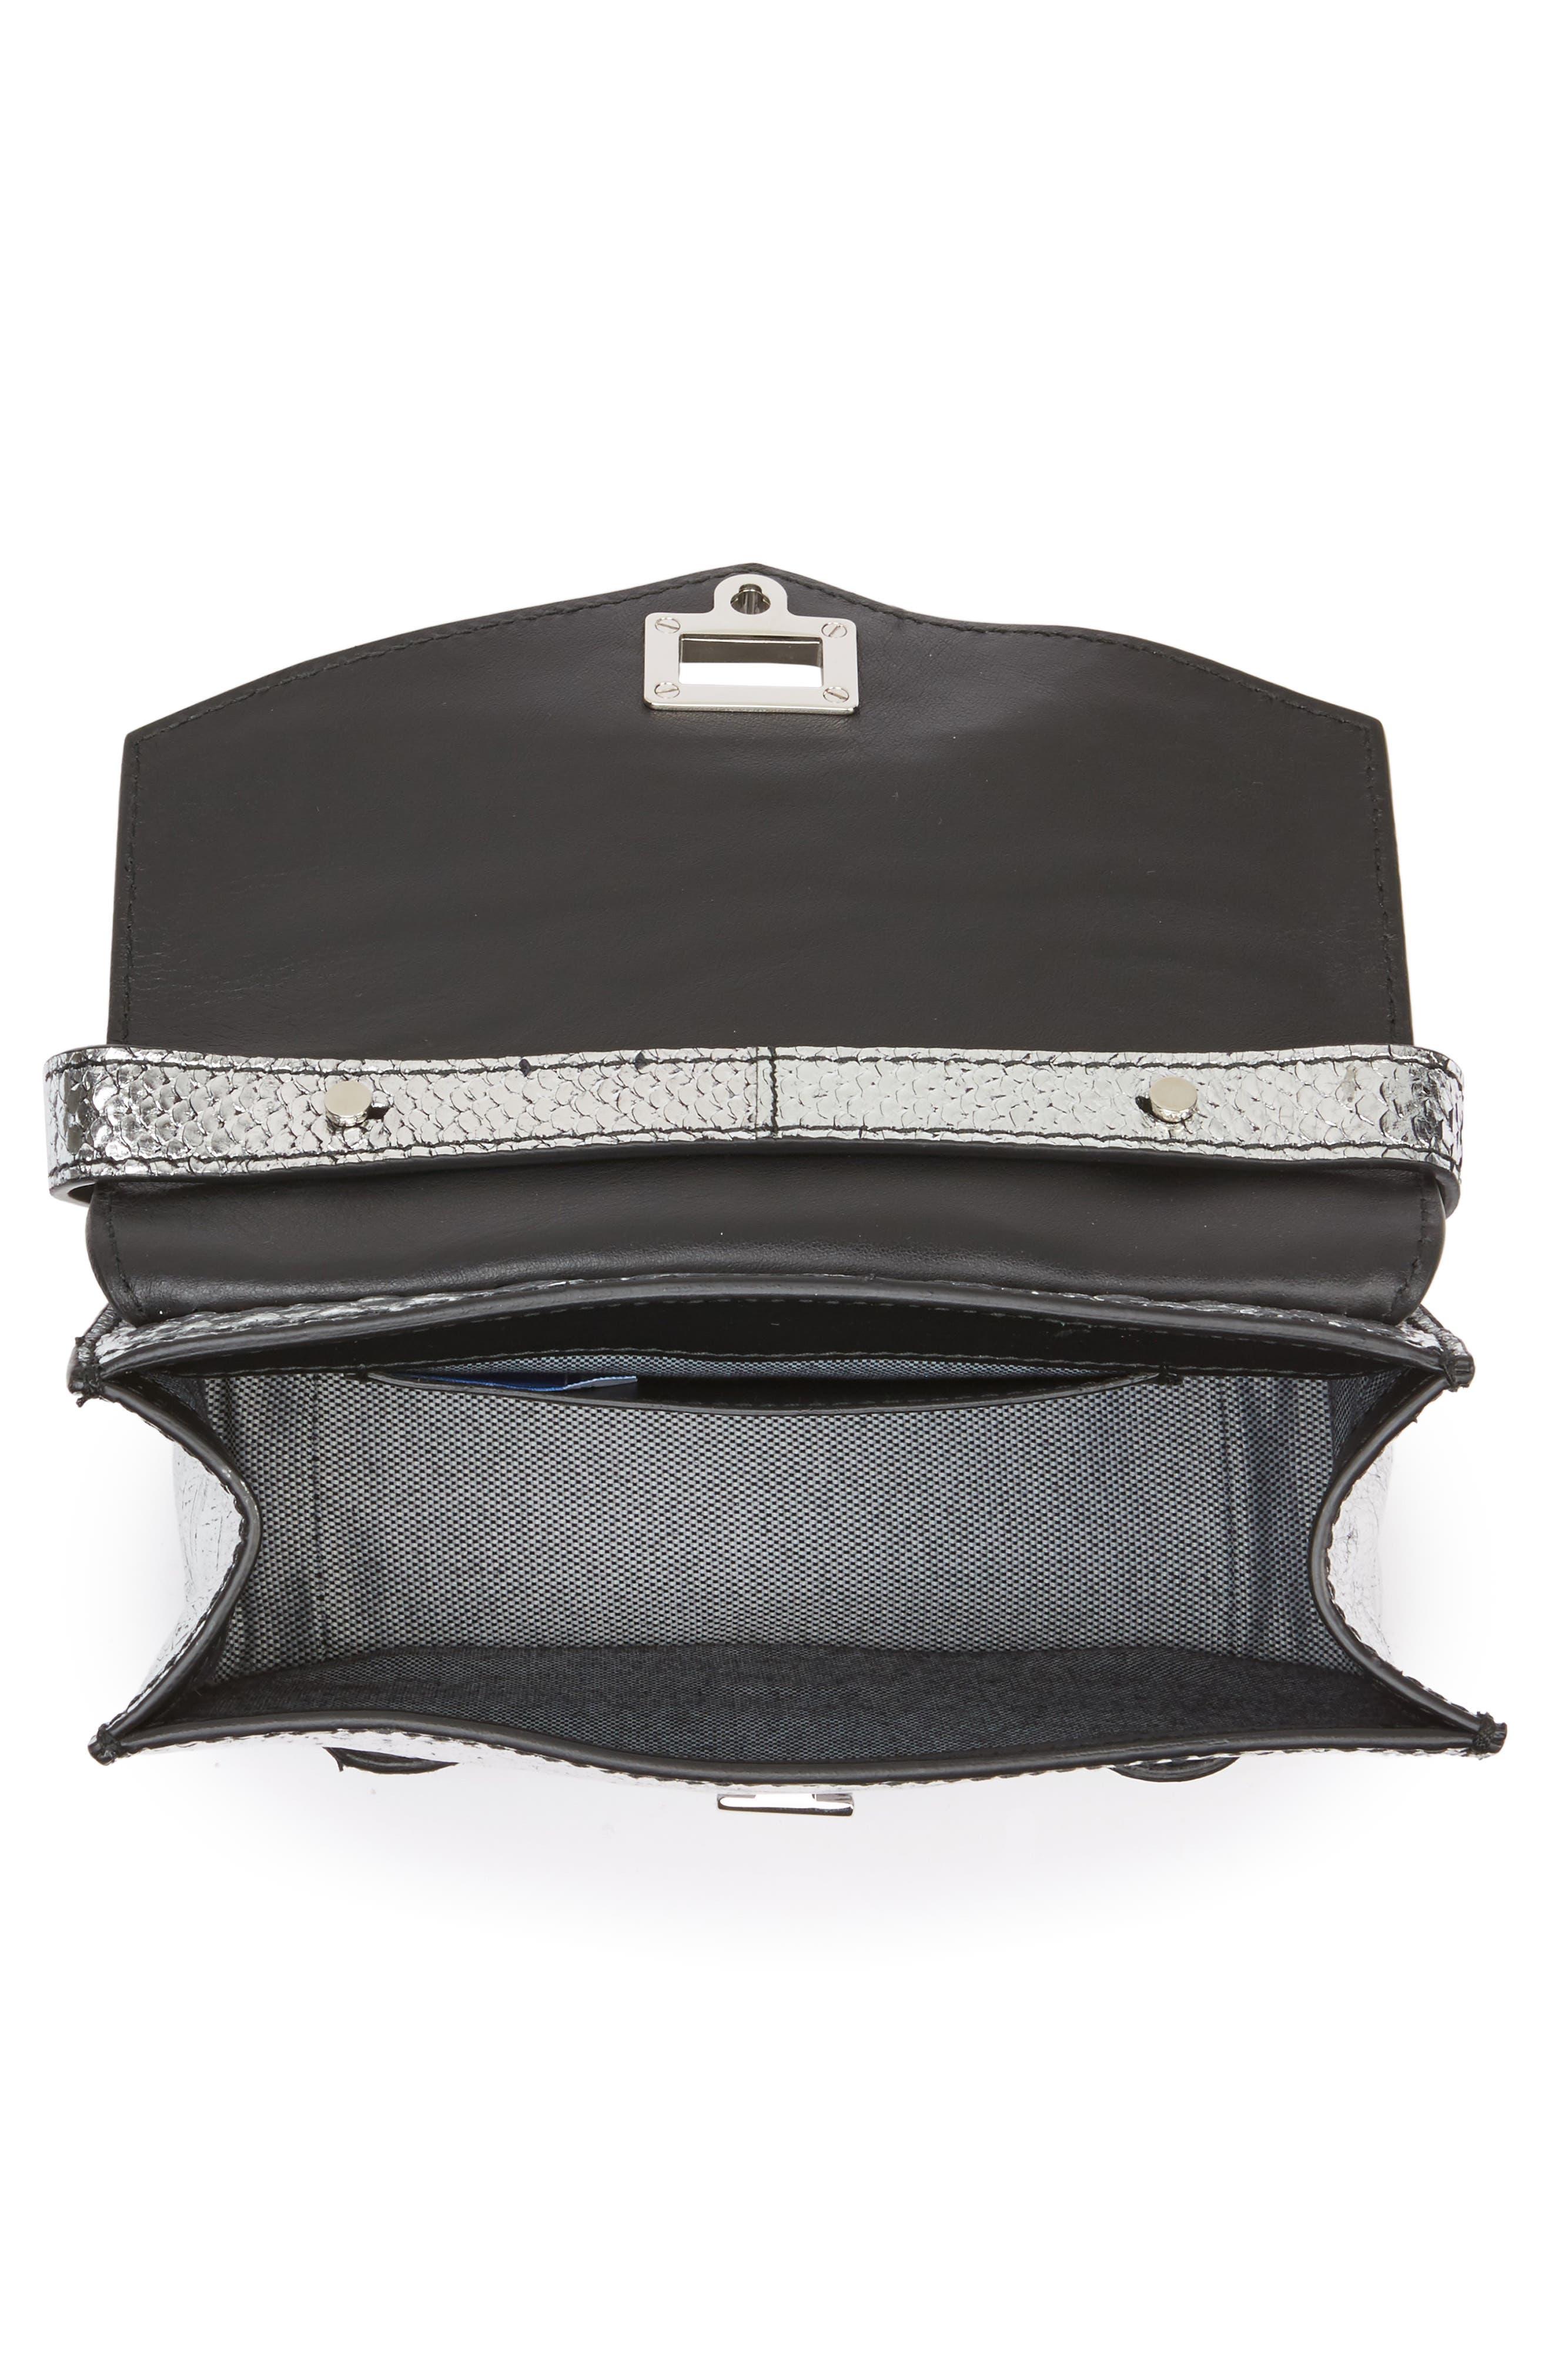 Mini PS1 Snakeskin Embossed Metallic Leather Crossbody Bag,                             Alternate thumbnail 4, color,                             040